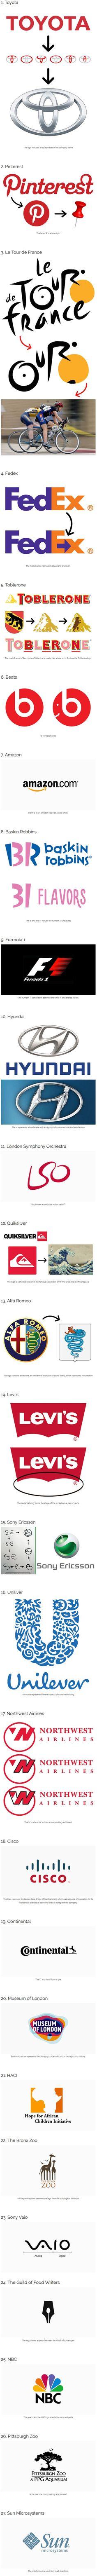 The Hidden Meaning Inside Famous Logos - Album on Imgur